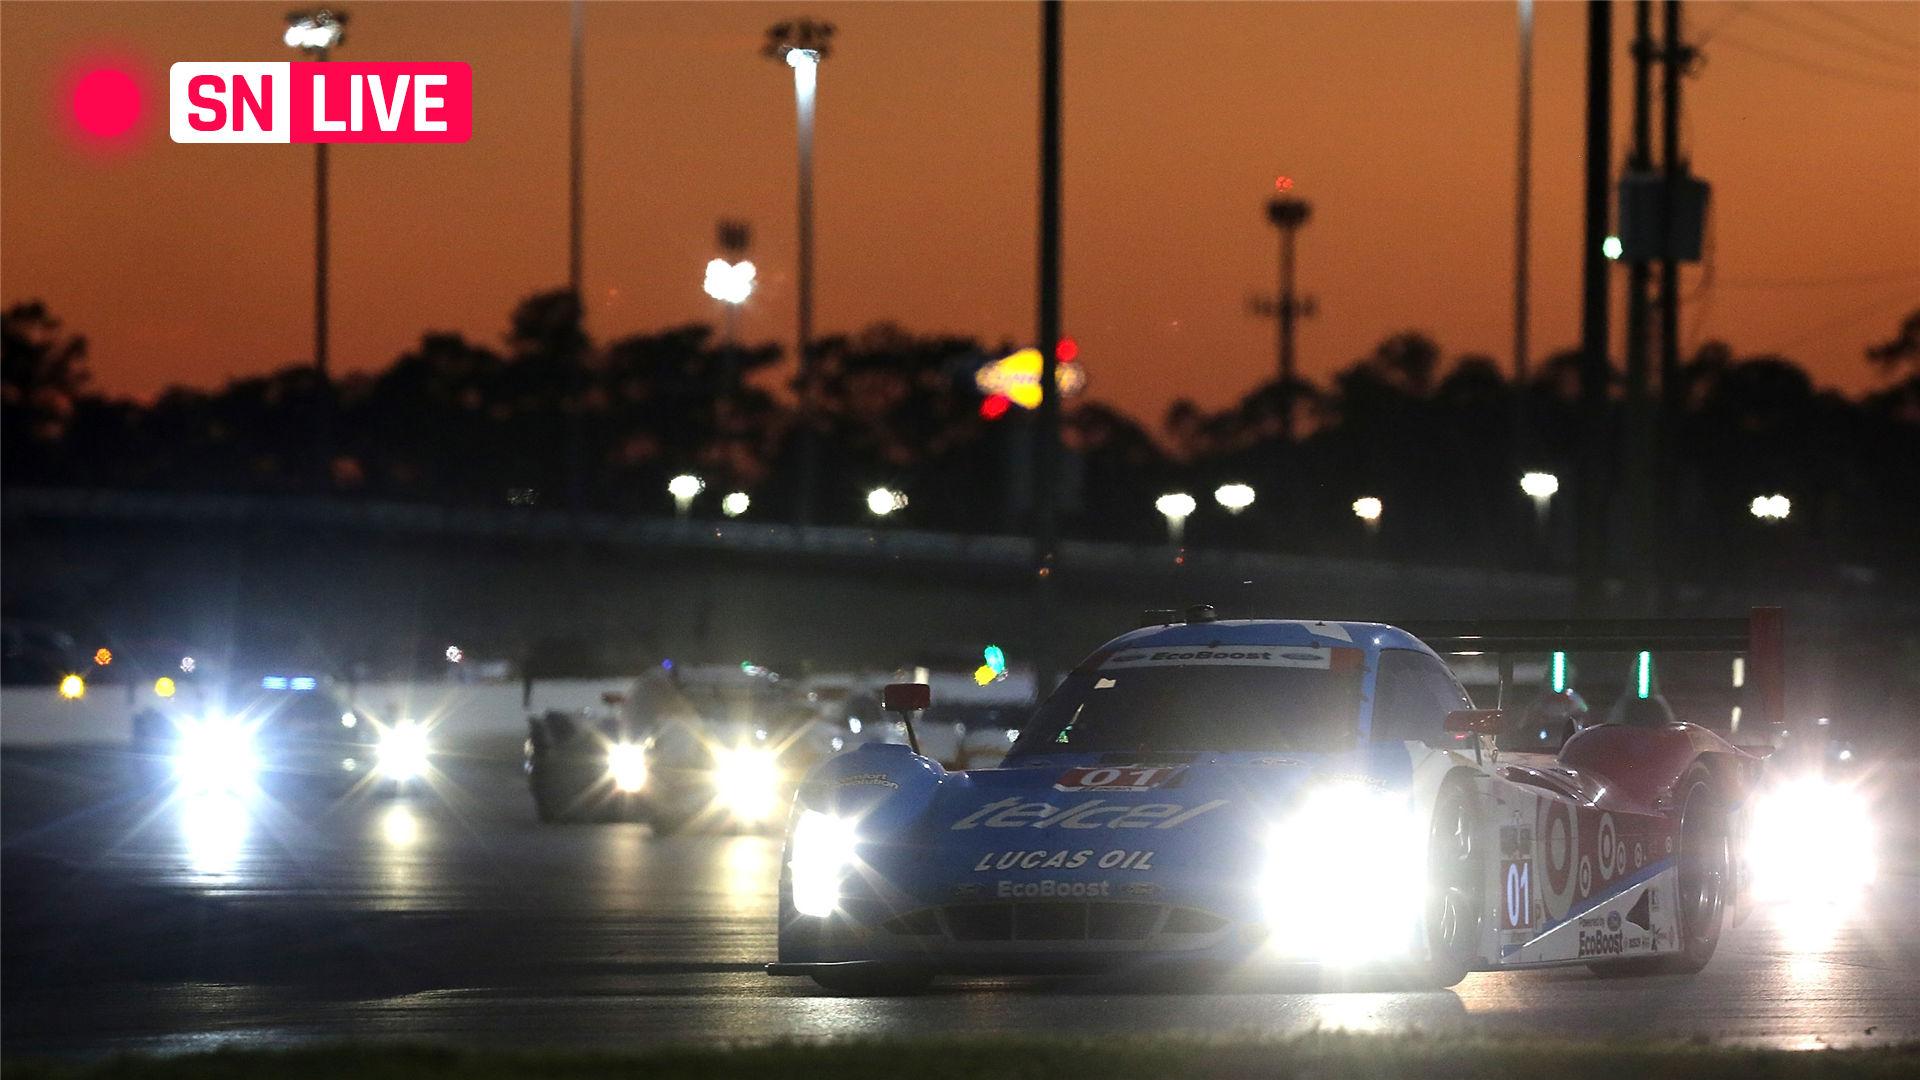 Imsa Live Stream >> Rolex 24 At Daytona Updates Live Stream Highlights From 2019 Race